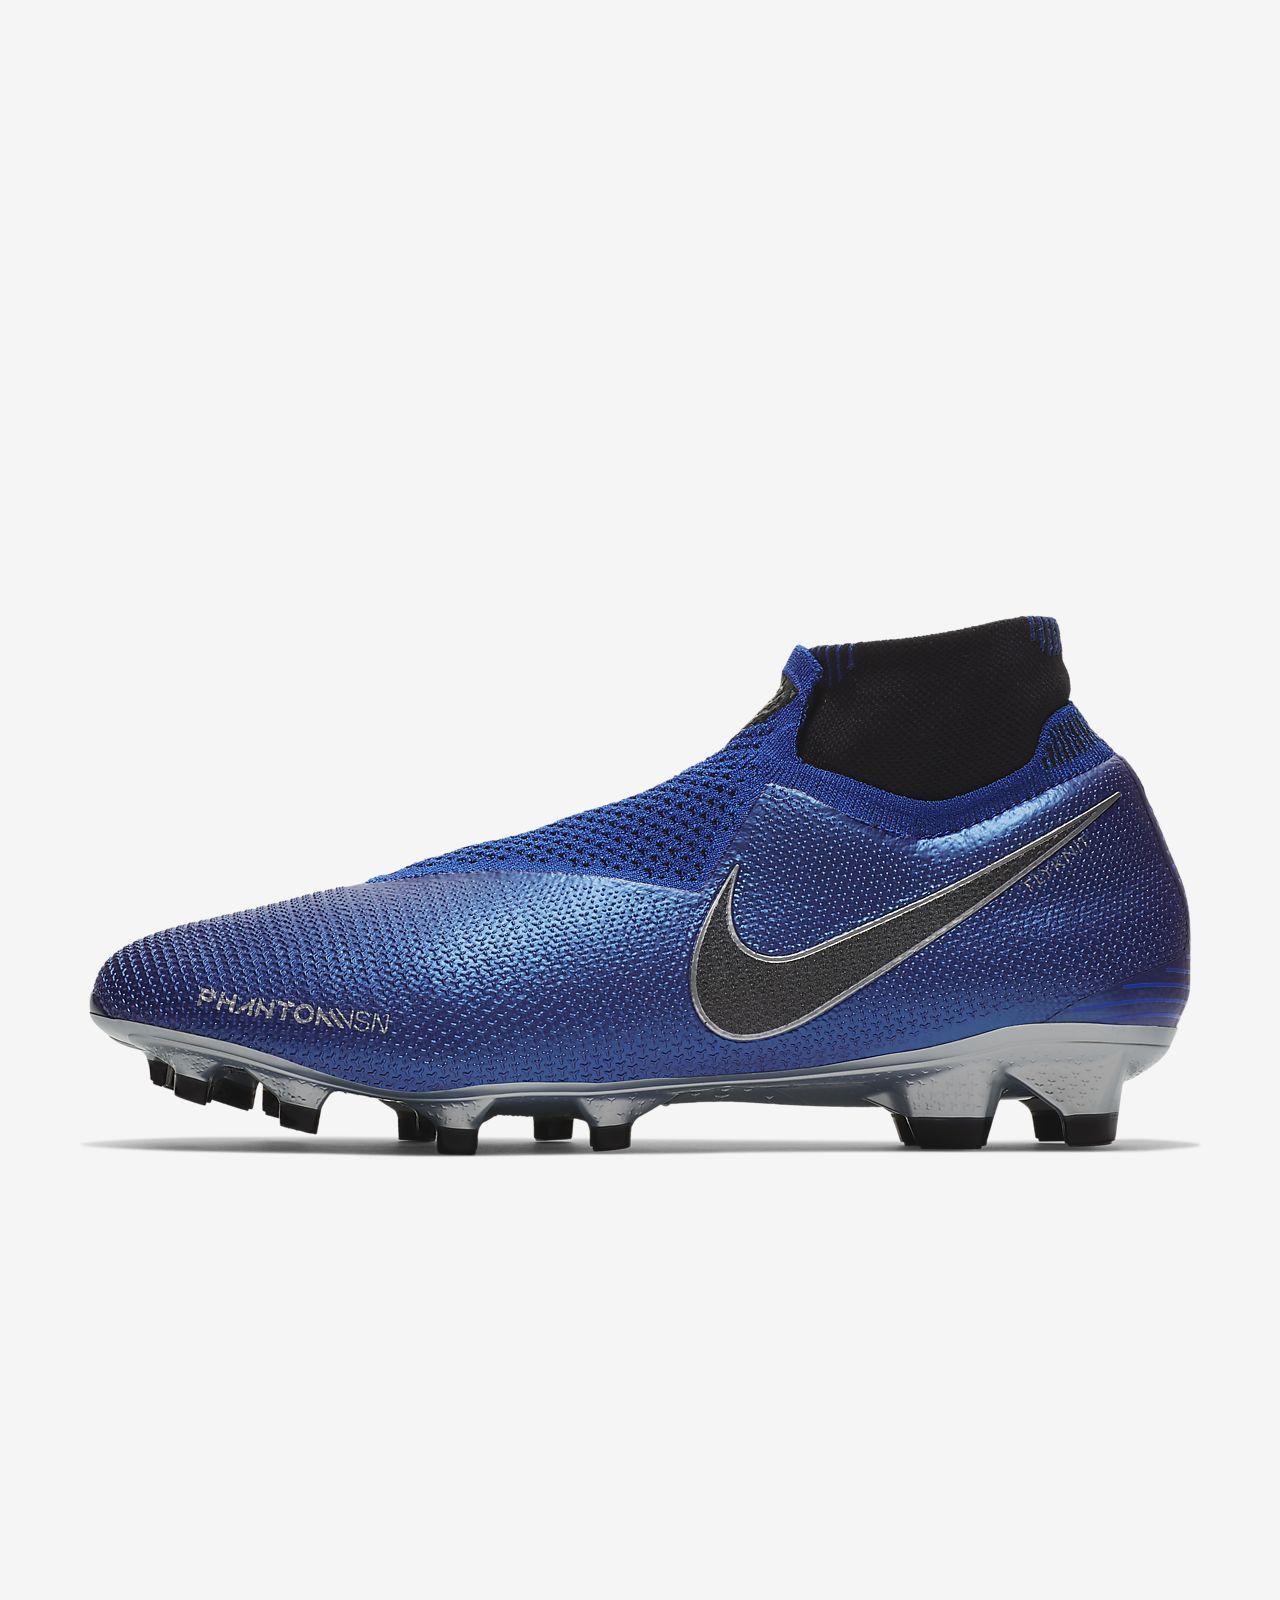 Chuteiras de futebol para terreno firme Nike PhantomVSN Elite Dynamic Fit FG ab8ec839c31f6